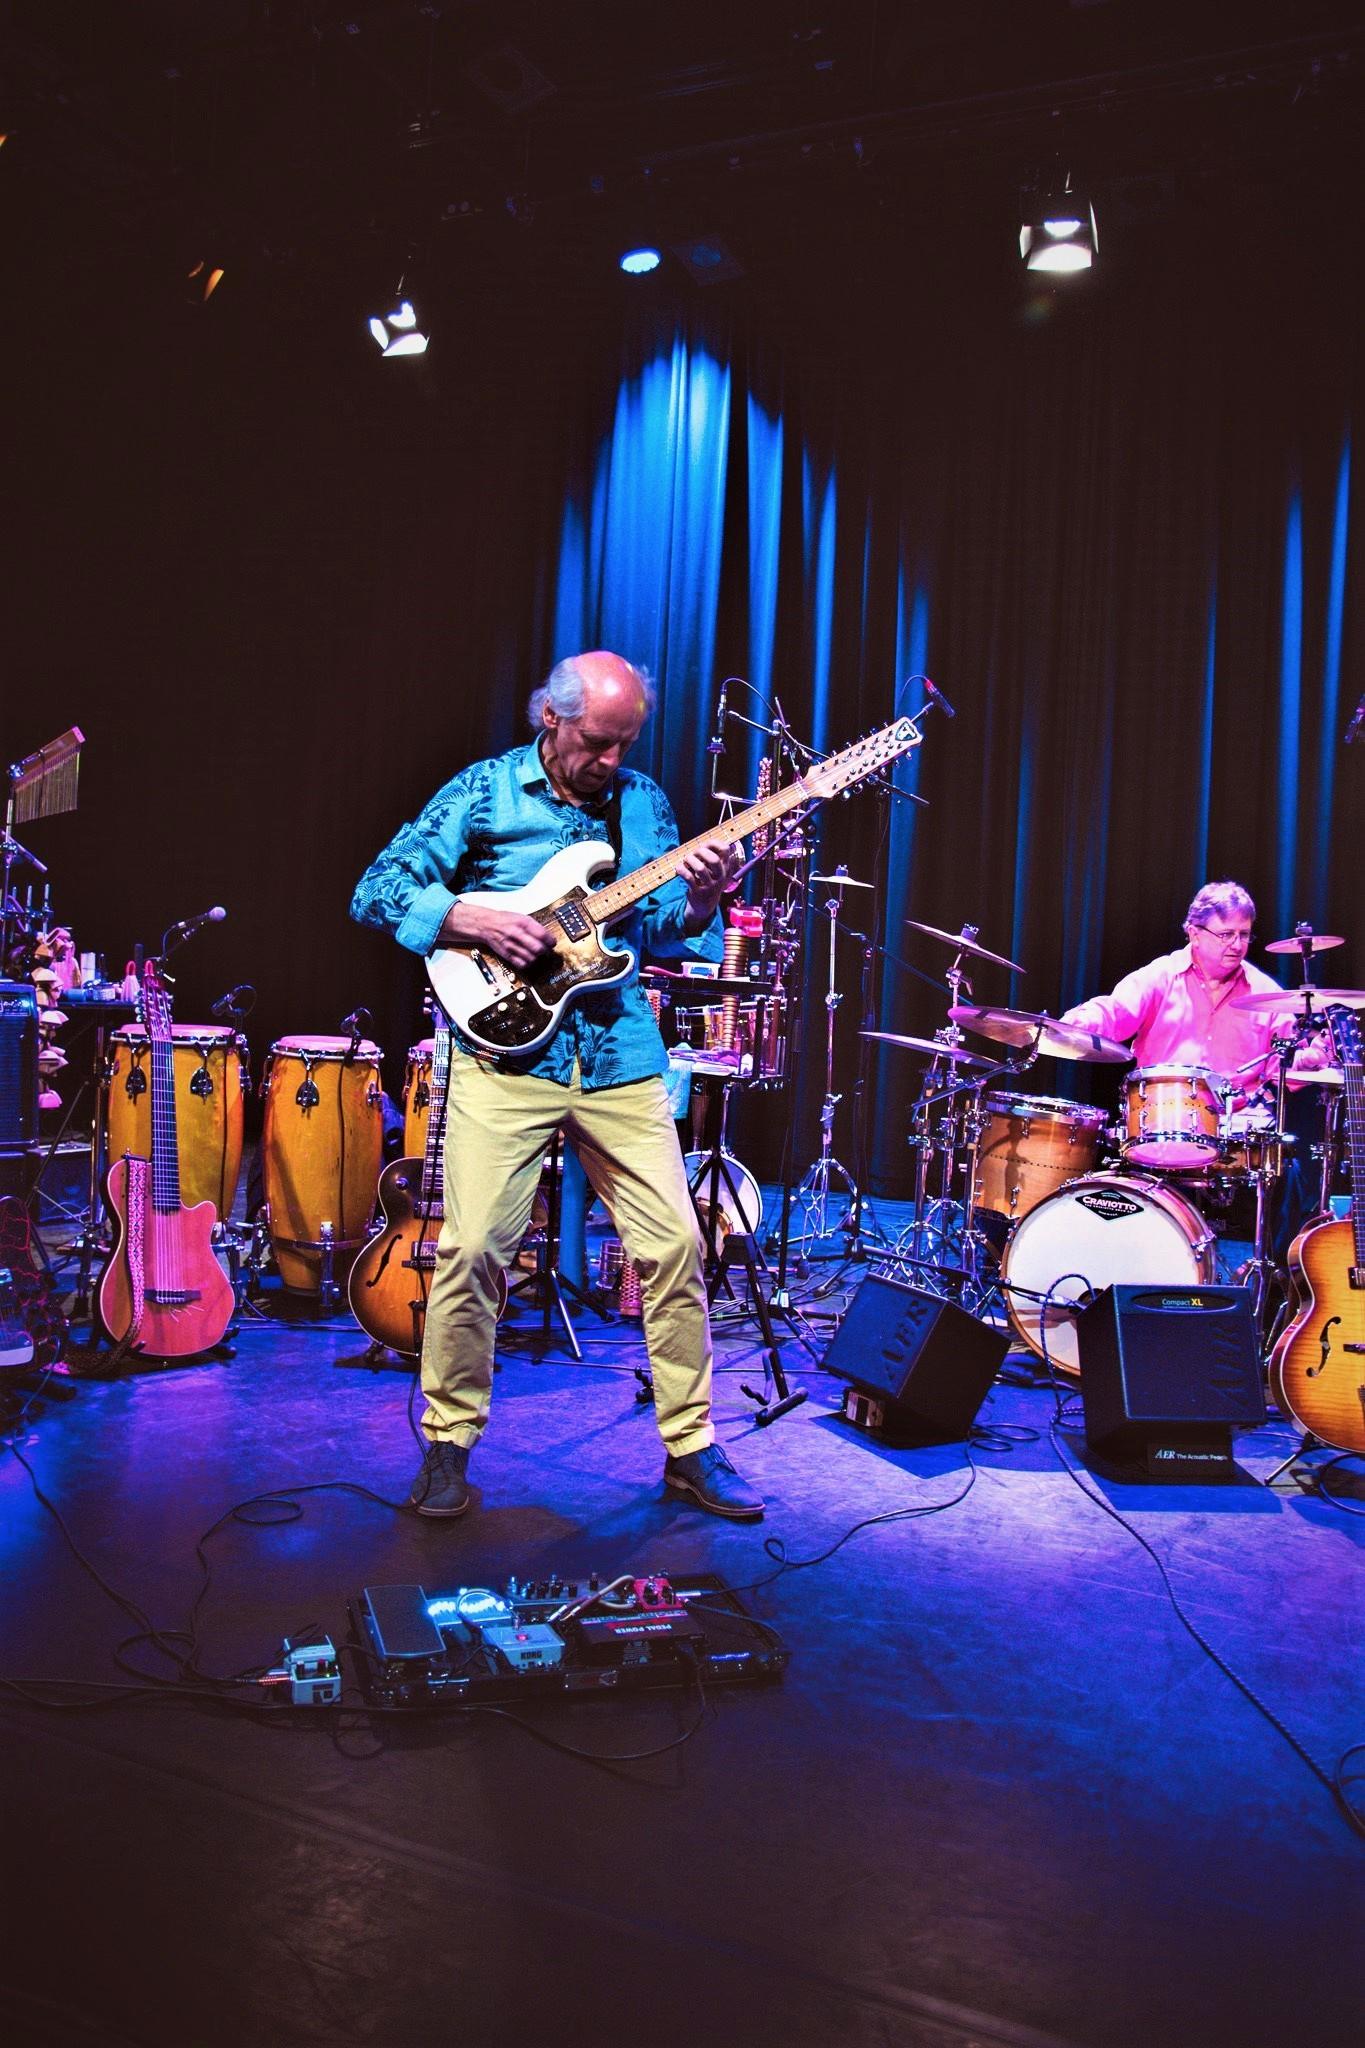 The Spin jazz Club - By Ryan Quarterman.